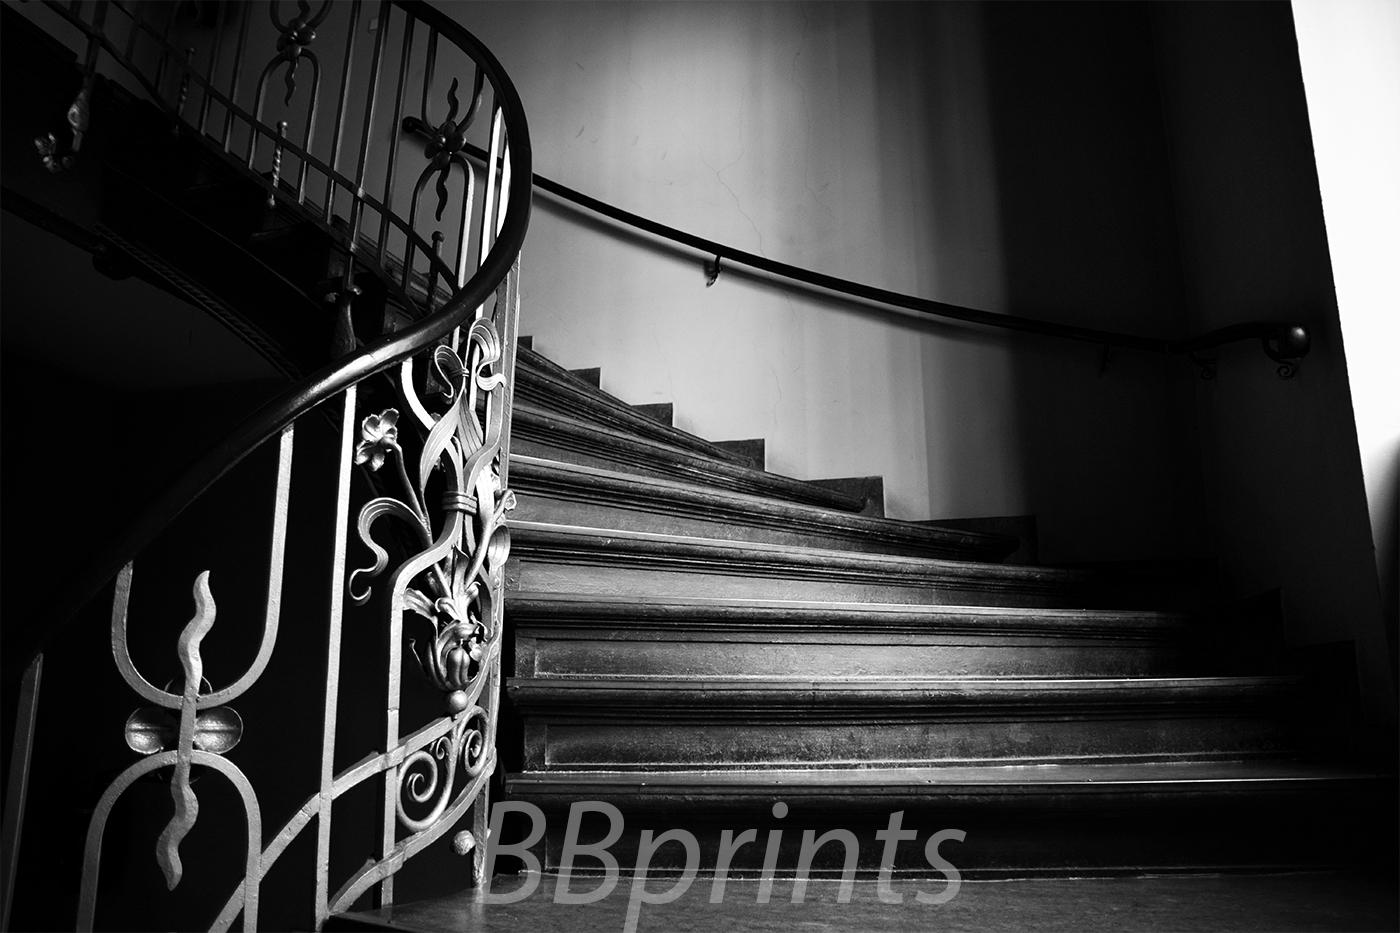 Stairs photo, architecture photo, photo set example image 3